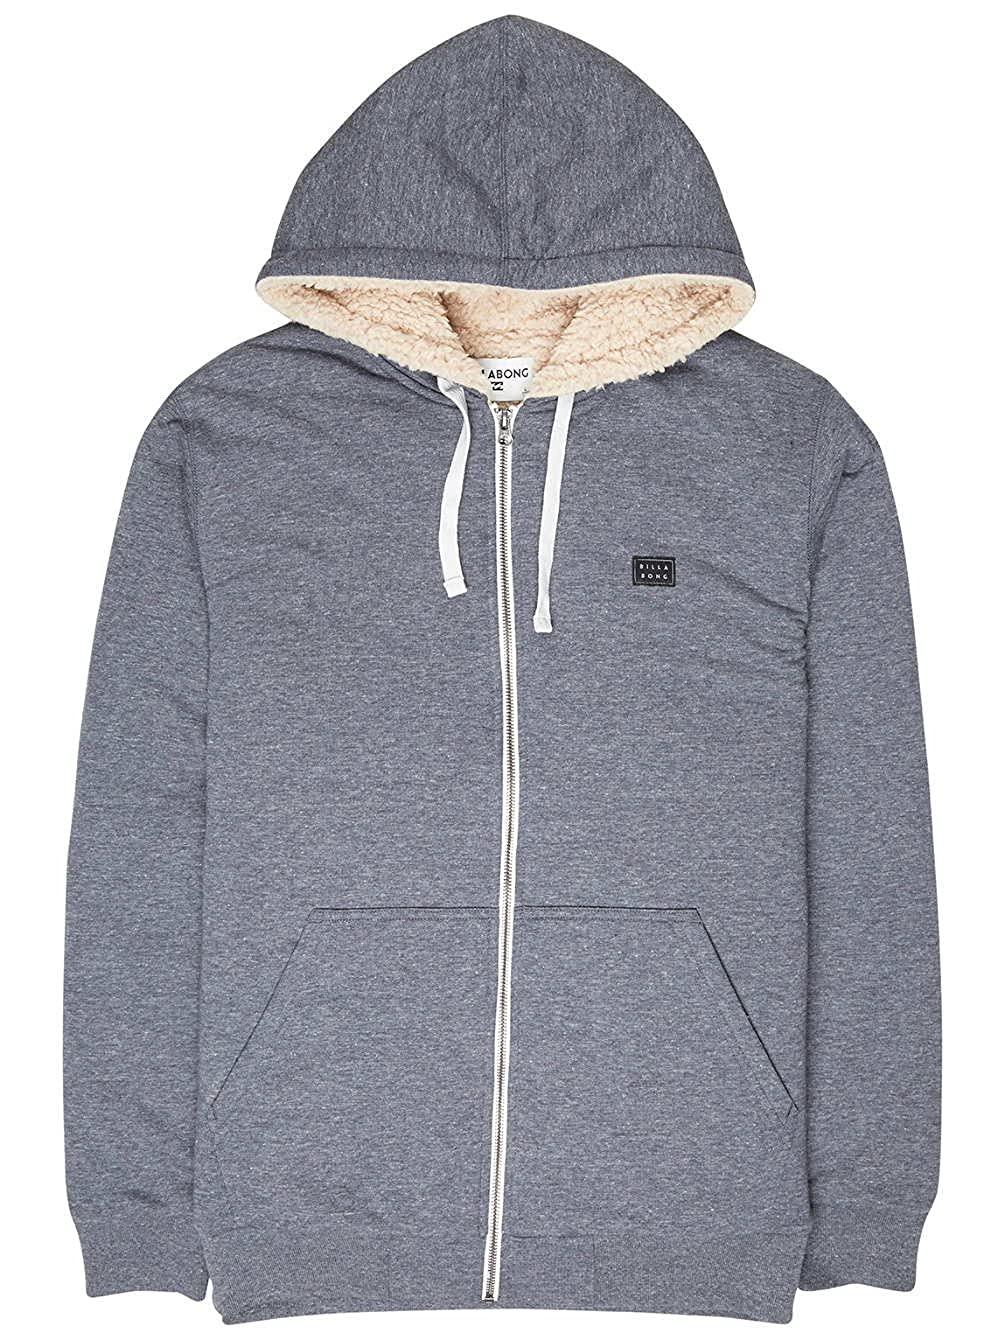 TALLA Large (Tamaño del fabricante:L). BILLABONG All Day Sherpa Zip Jersey, Hombre